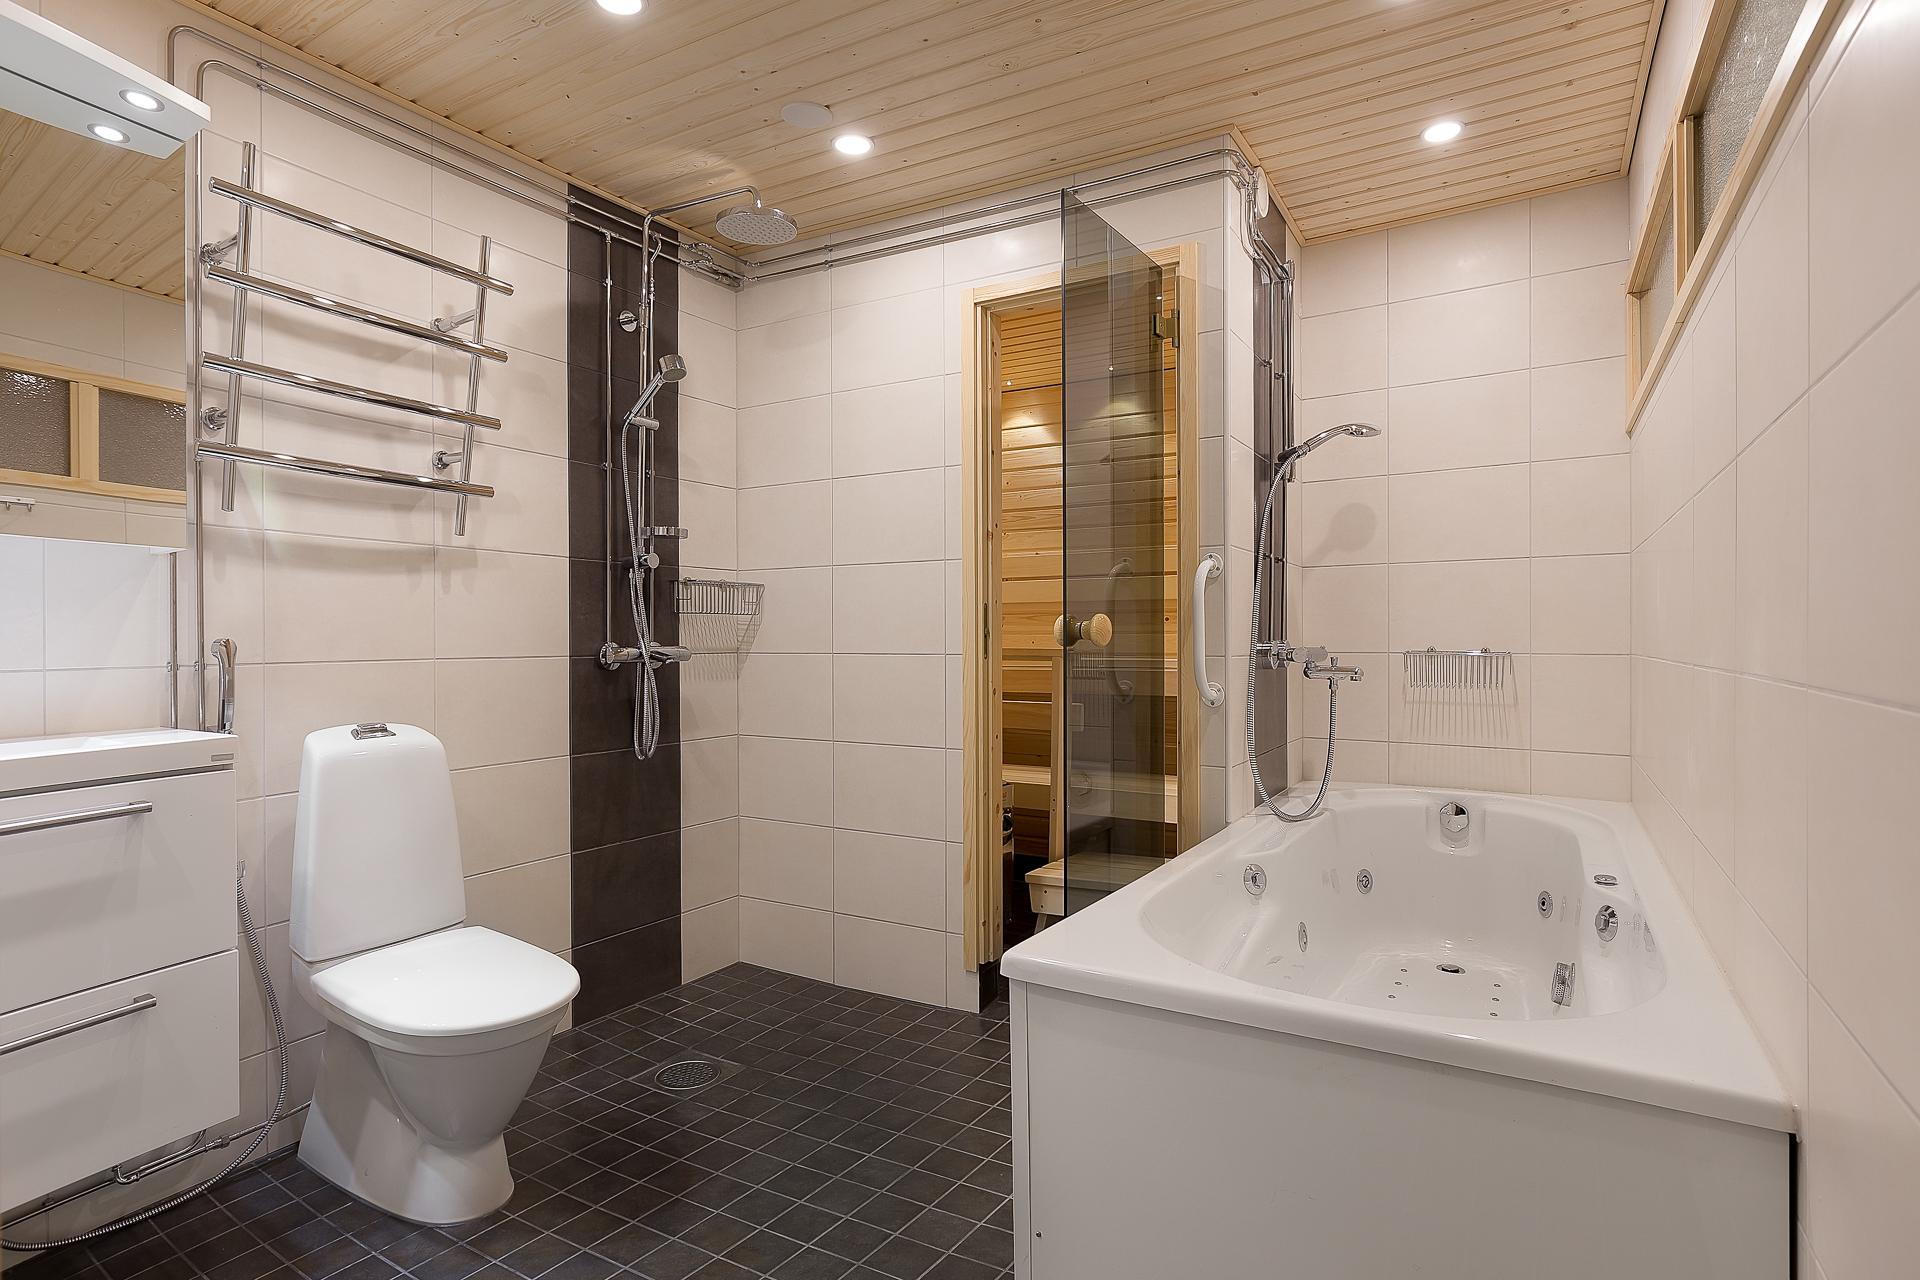 Kylpyhuone ja sauna remontti